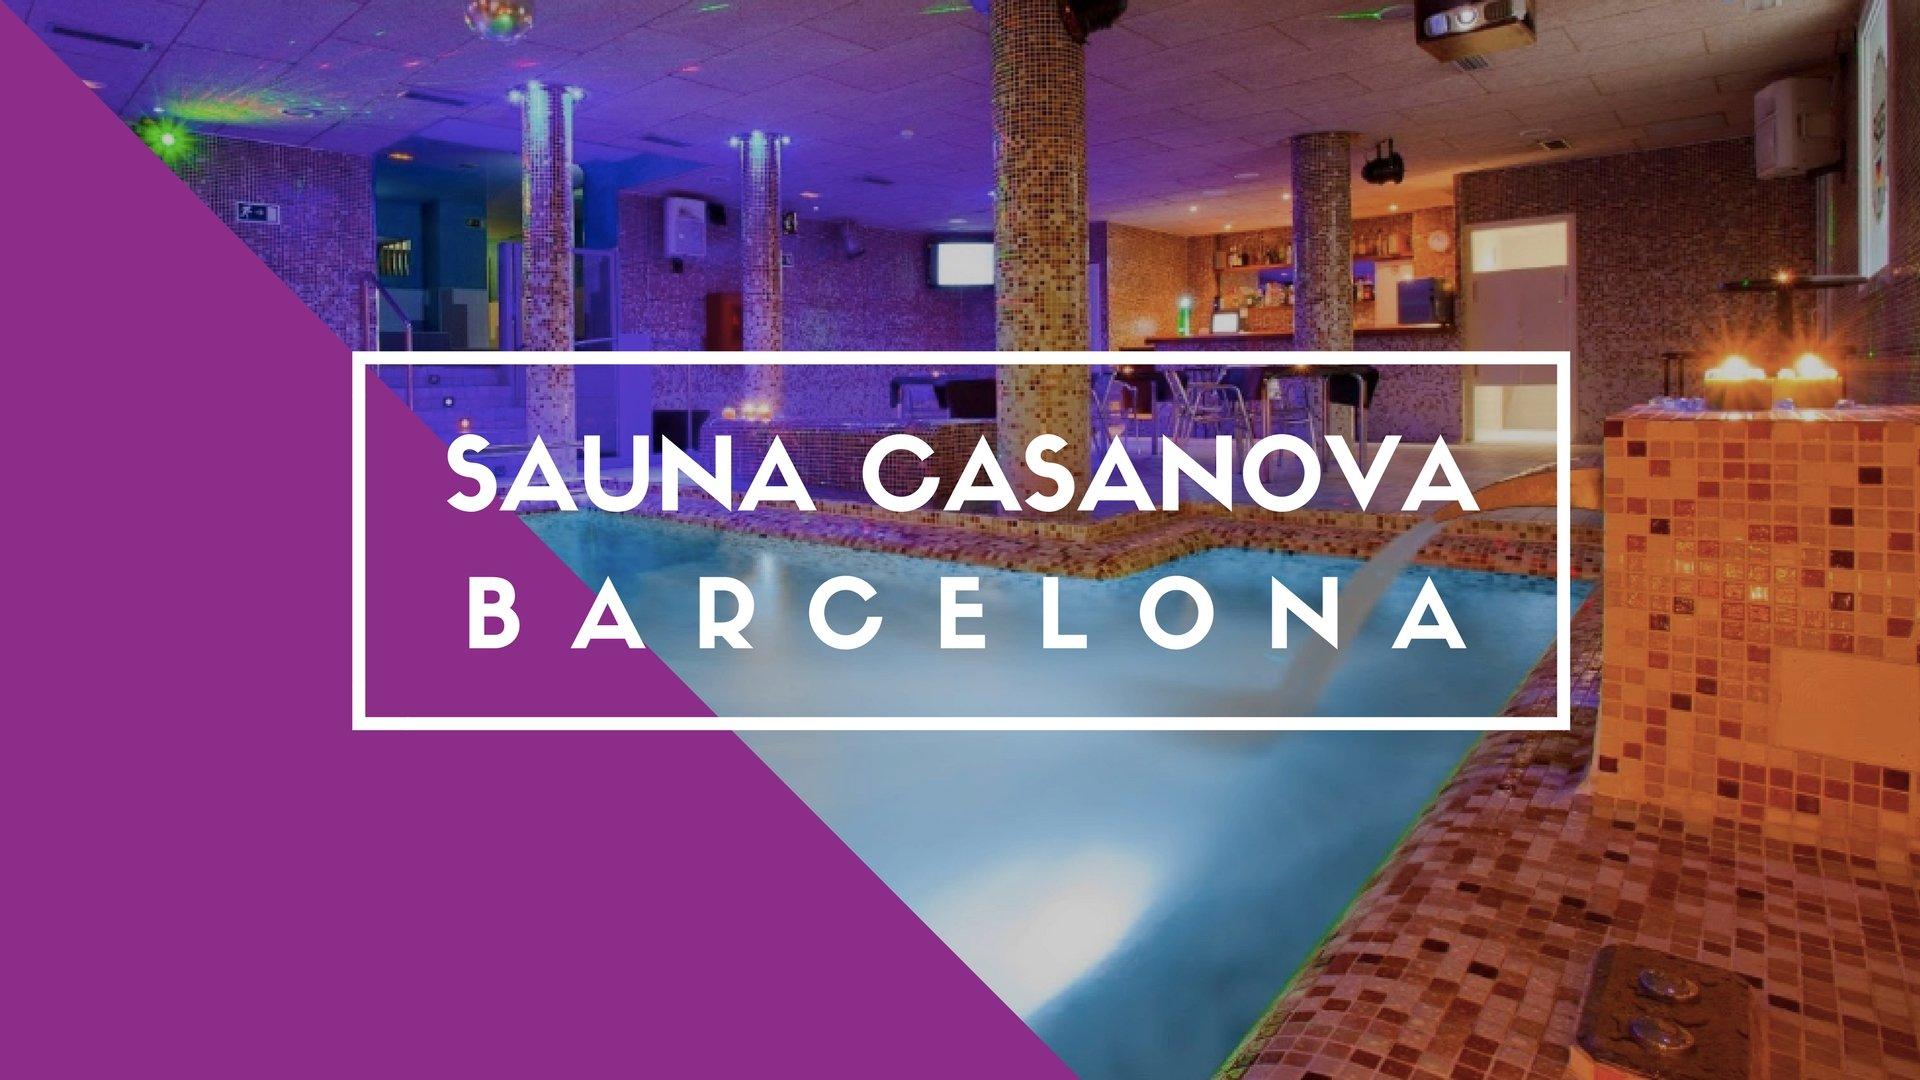 Sauna Casanova, Barcelona